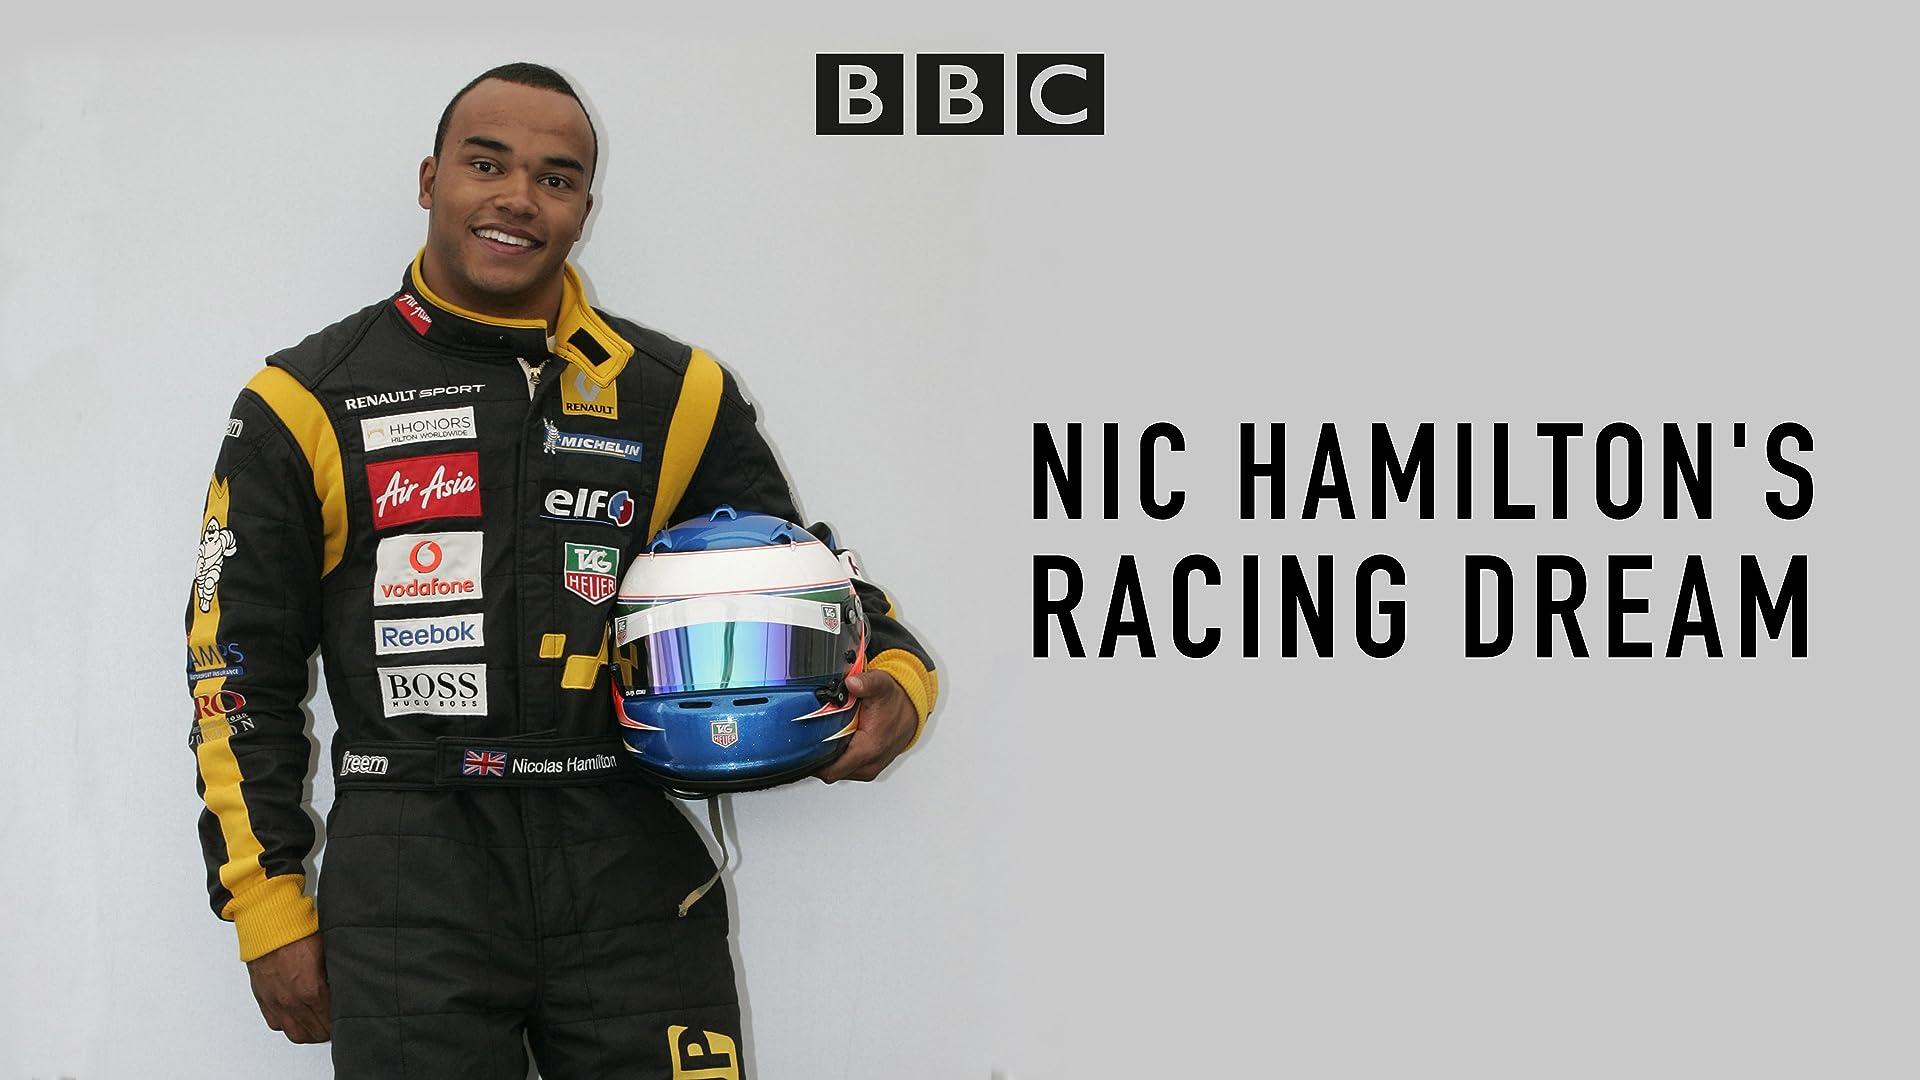 Nic Hamilton's Racing Dream